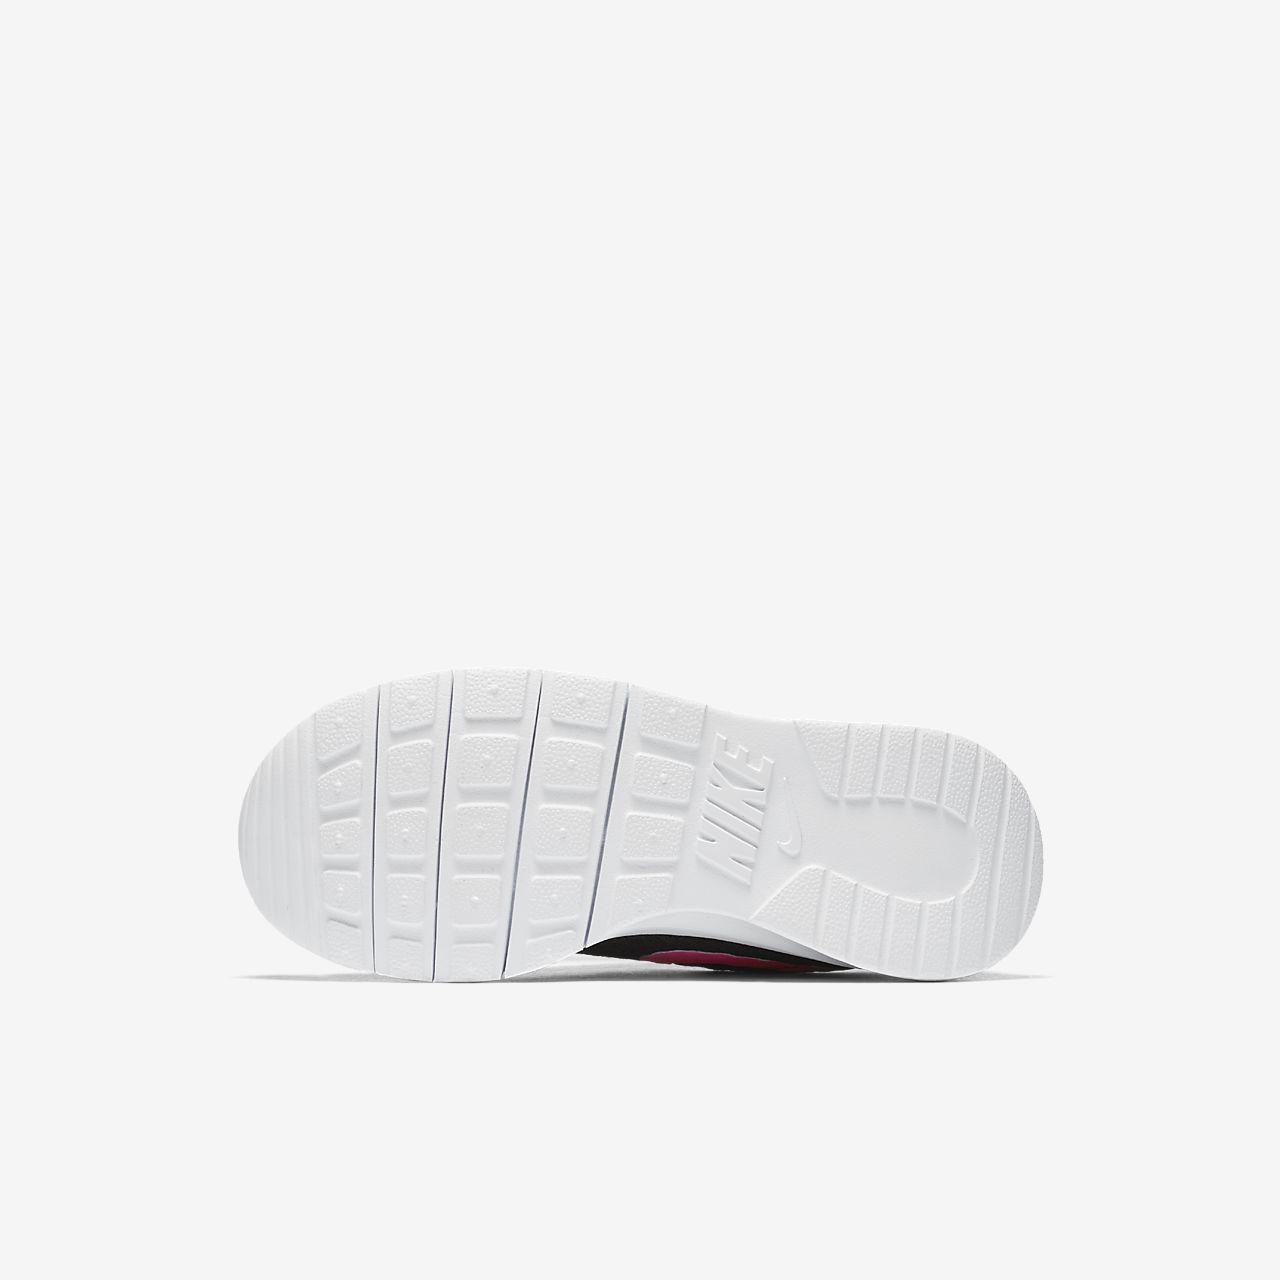 reputable site fff2d d7514 ... Nike Tanjun Younger Kids  Shoe